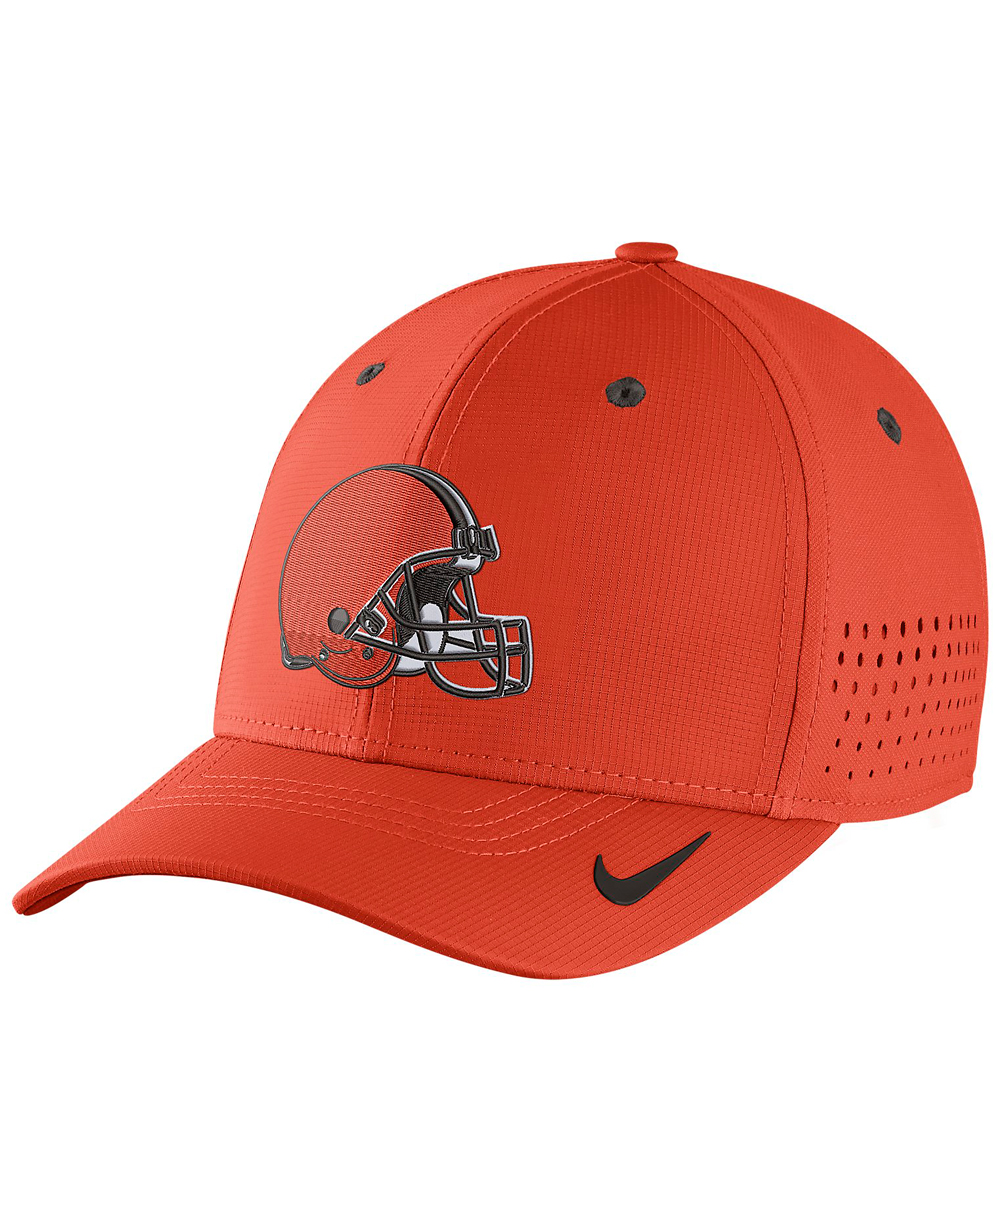 Men's Cap Legacy Vapor Swoosh Flex NFL Browns